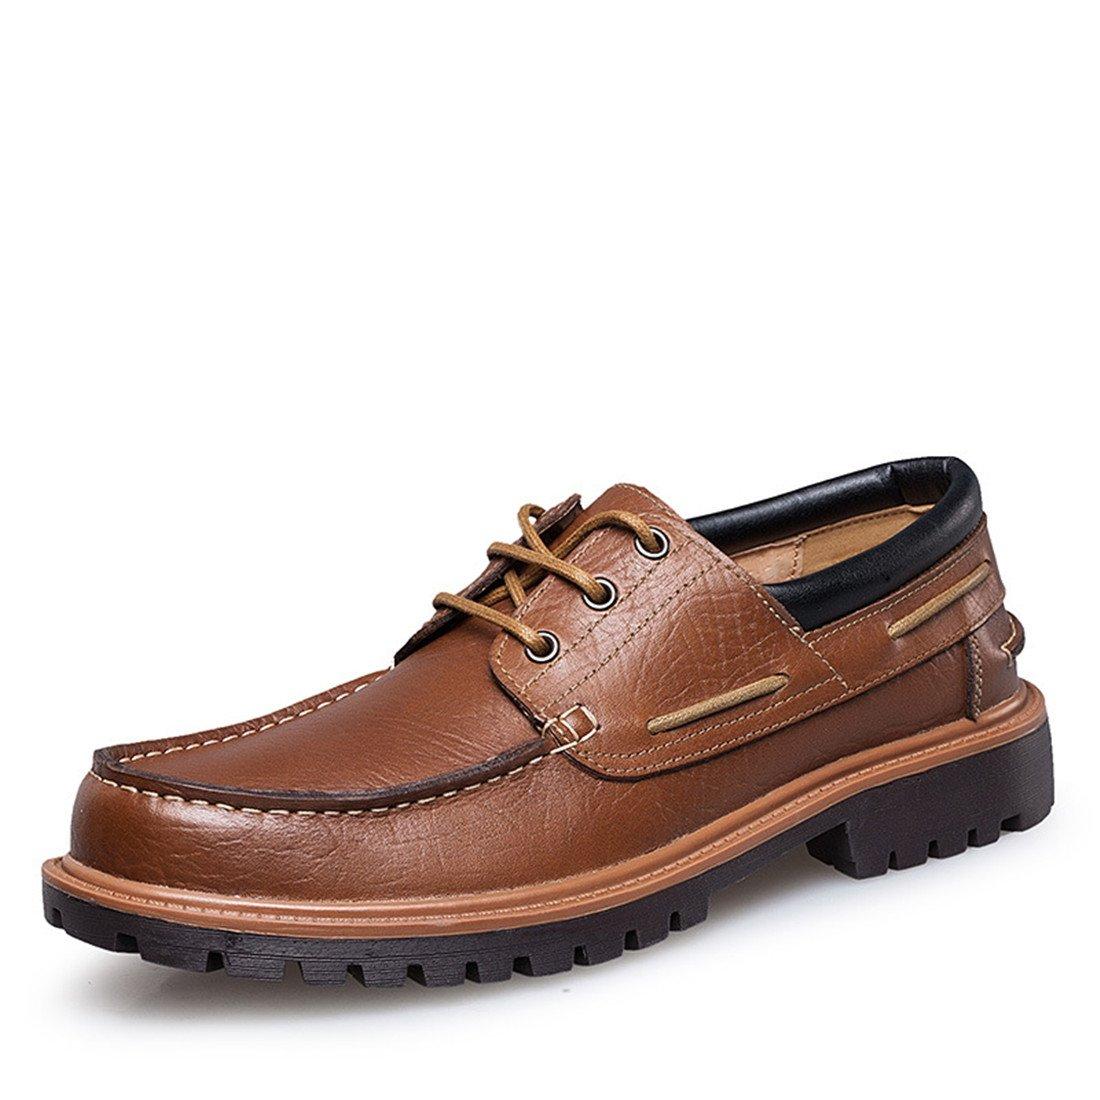 Mens Classic Lace Up Boat Shoe Cowskin Three-Eye Causal Shoe 5087